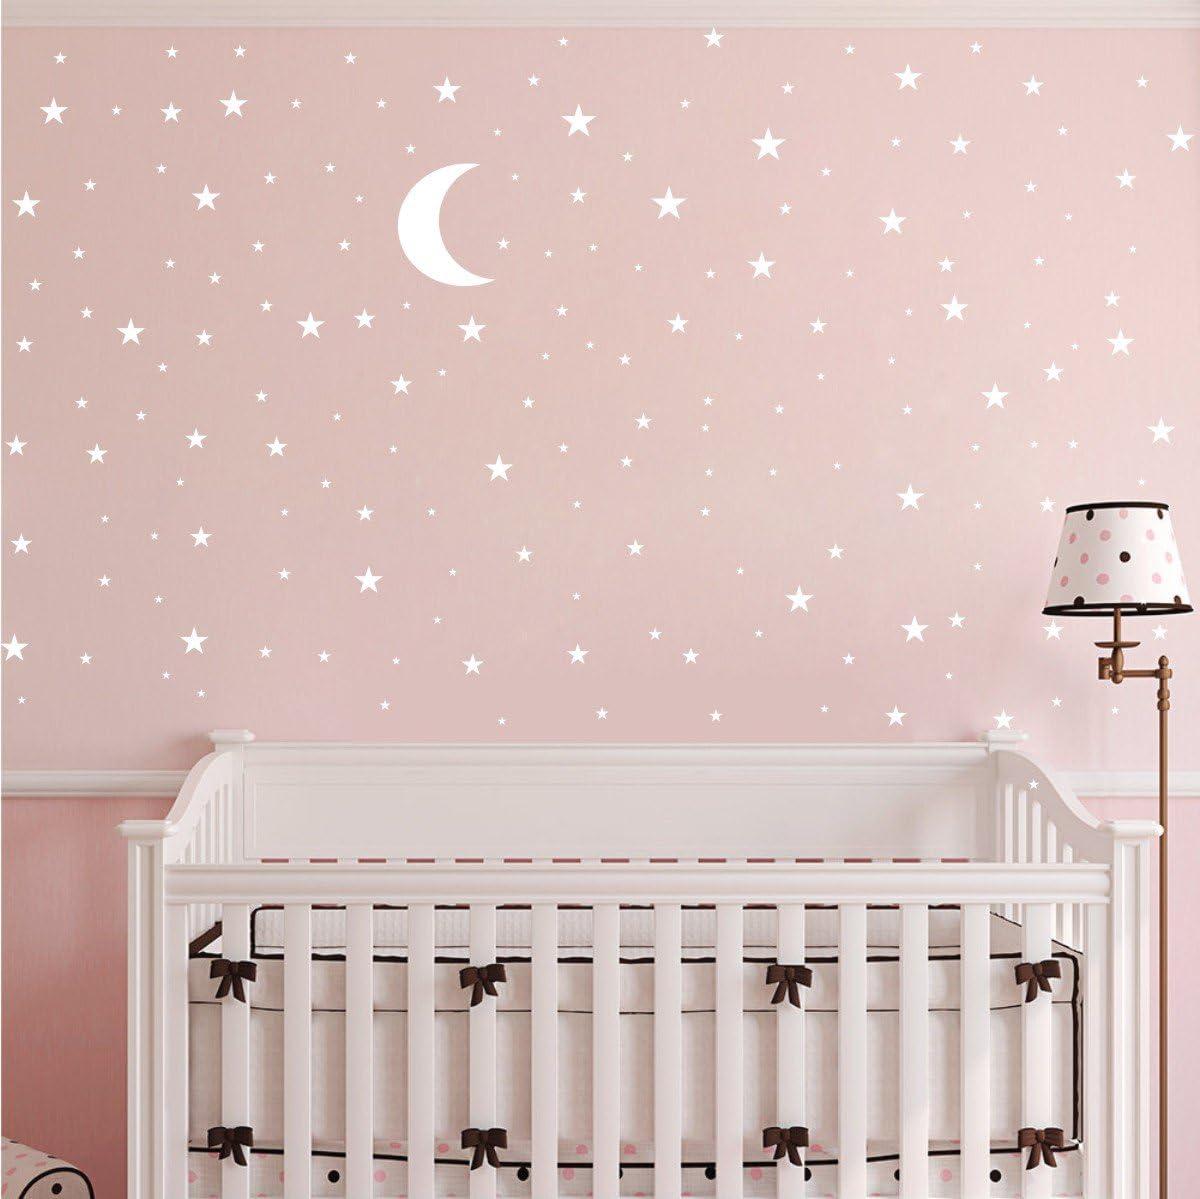 JURUOXIN Moon and Stars Wall Decal Vinyl Sticker for Kids Boy Girls Baby Room Decoration Good Night Nursery Wall Decor Home House Bedroom Design YMX16 Matte Gold